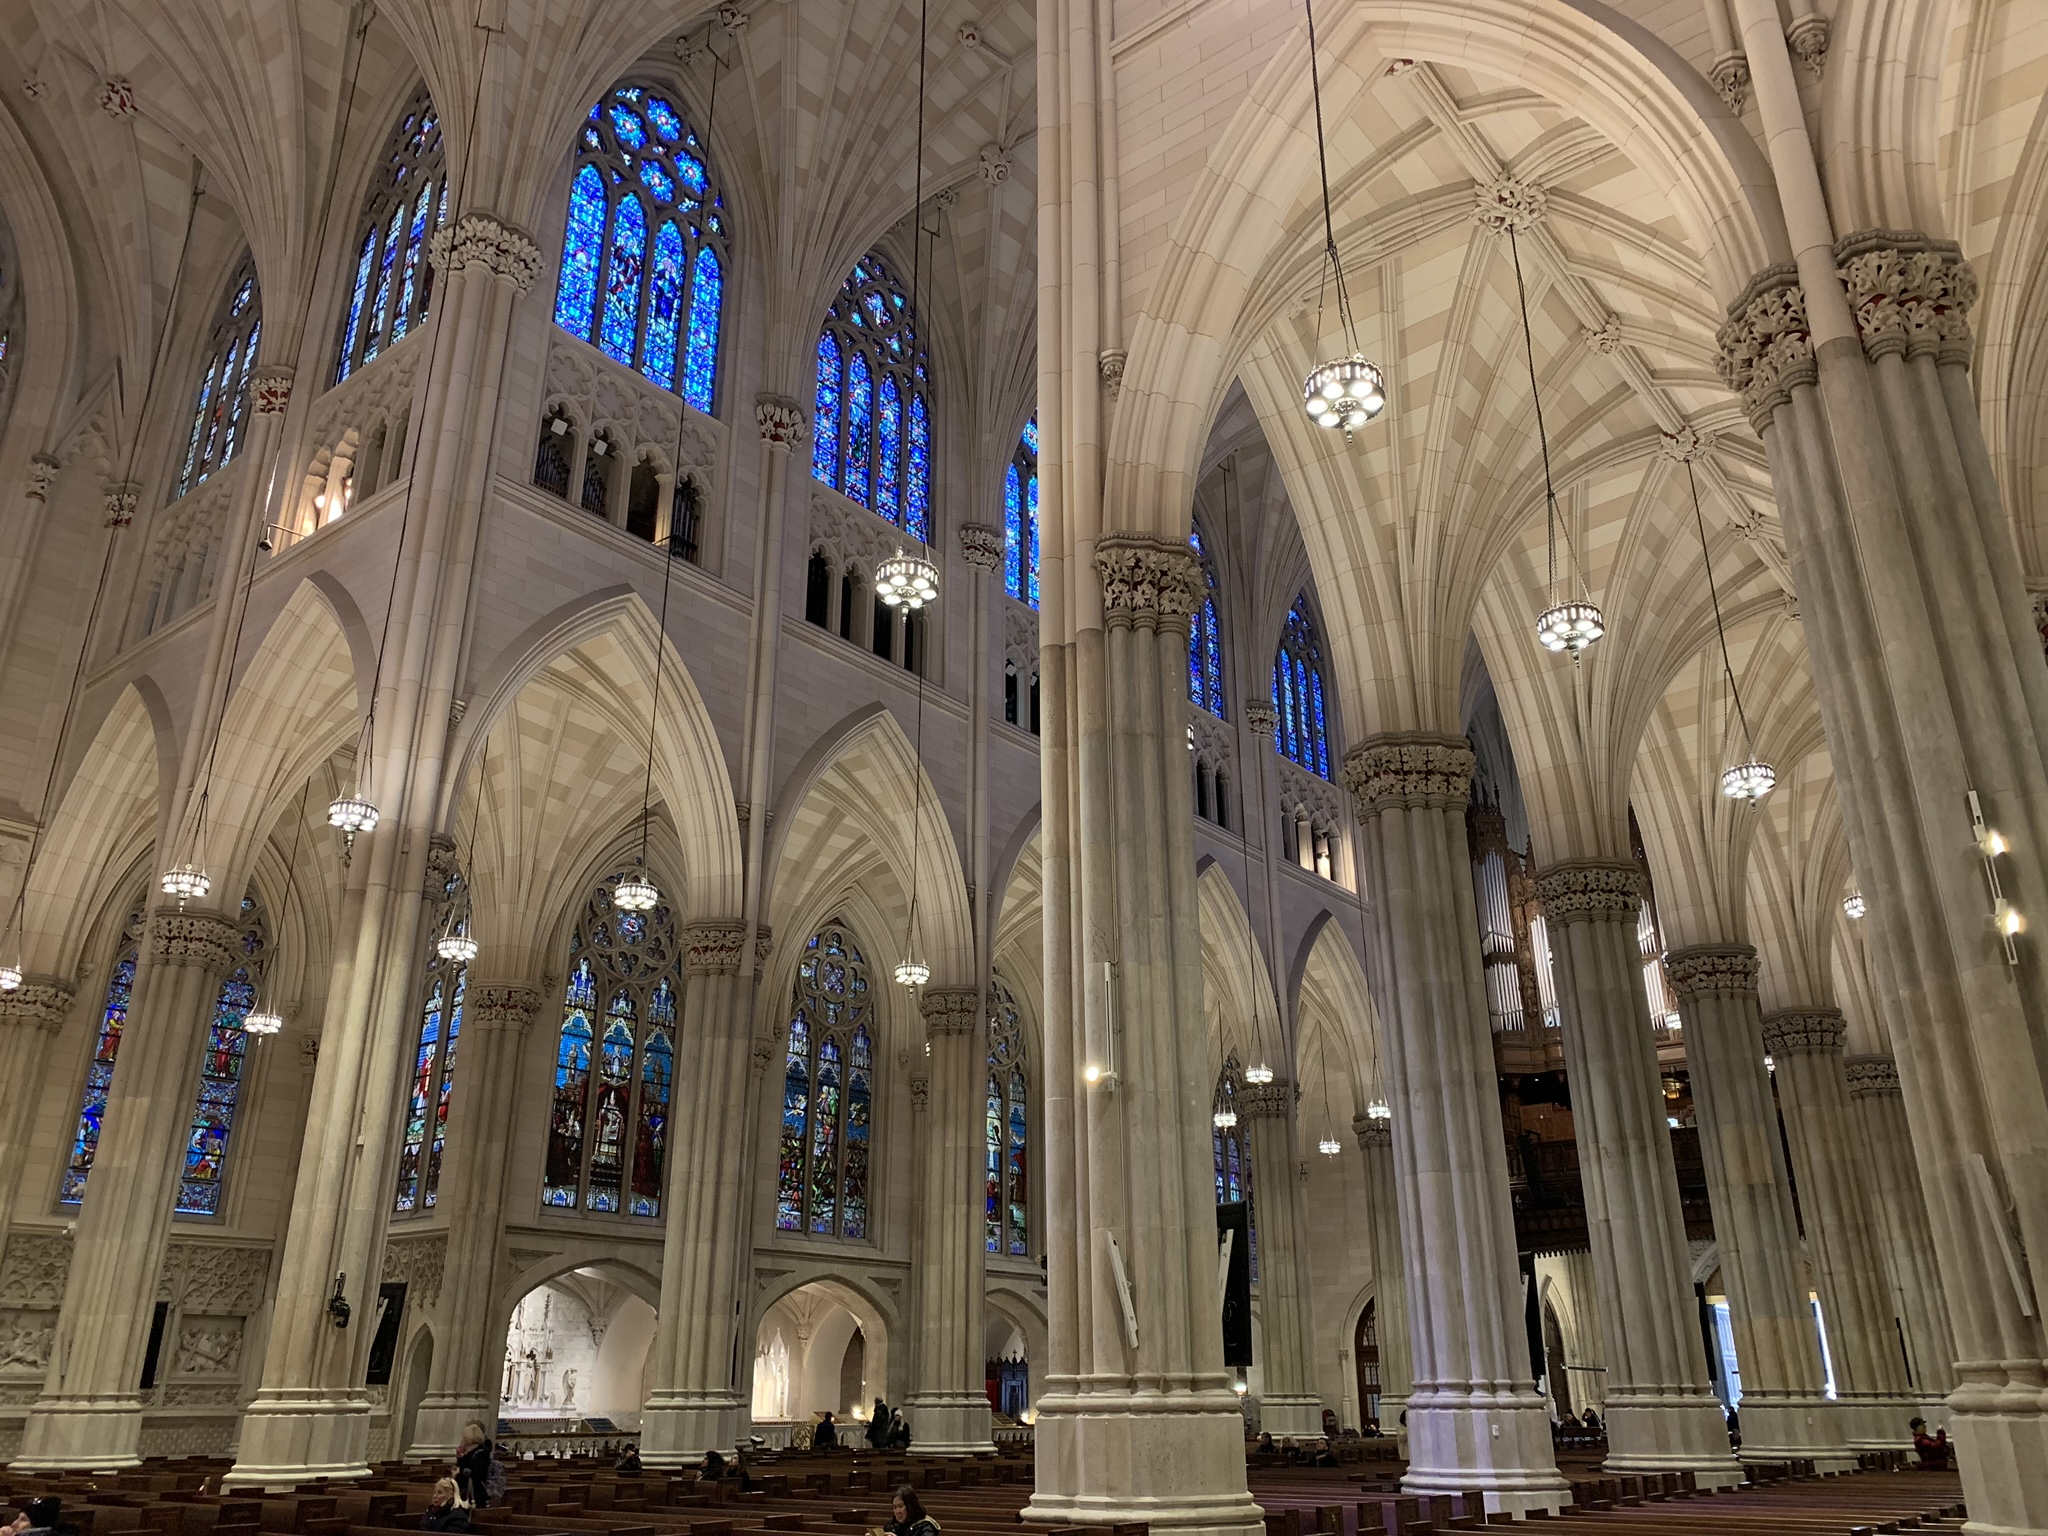 Interior of Saint Patrick's Cathedral.